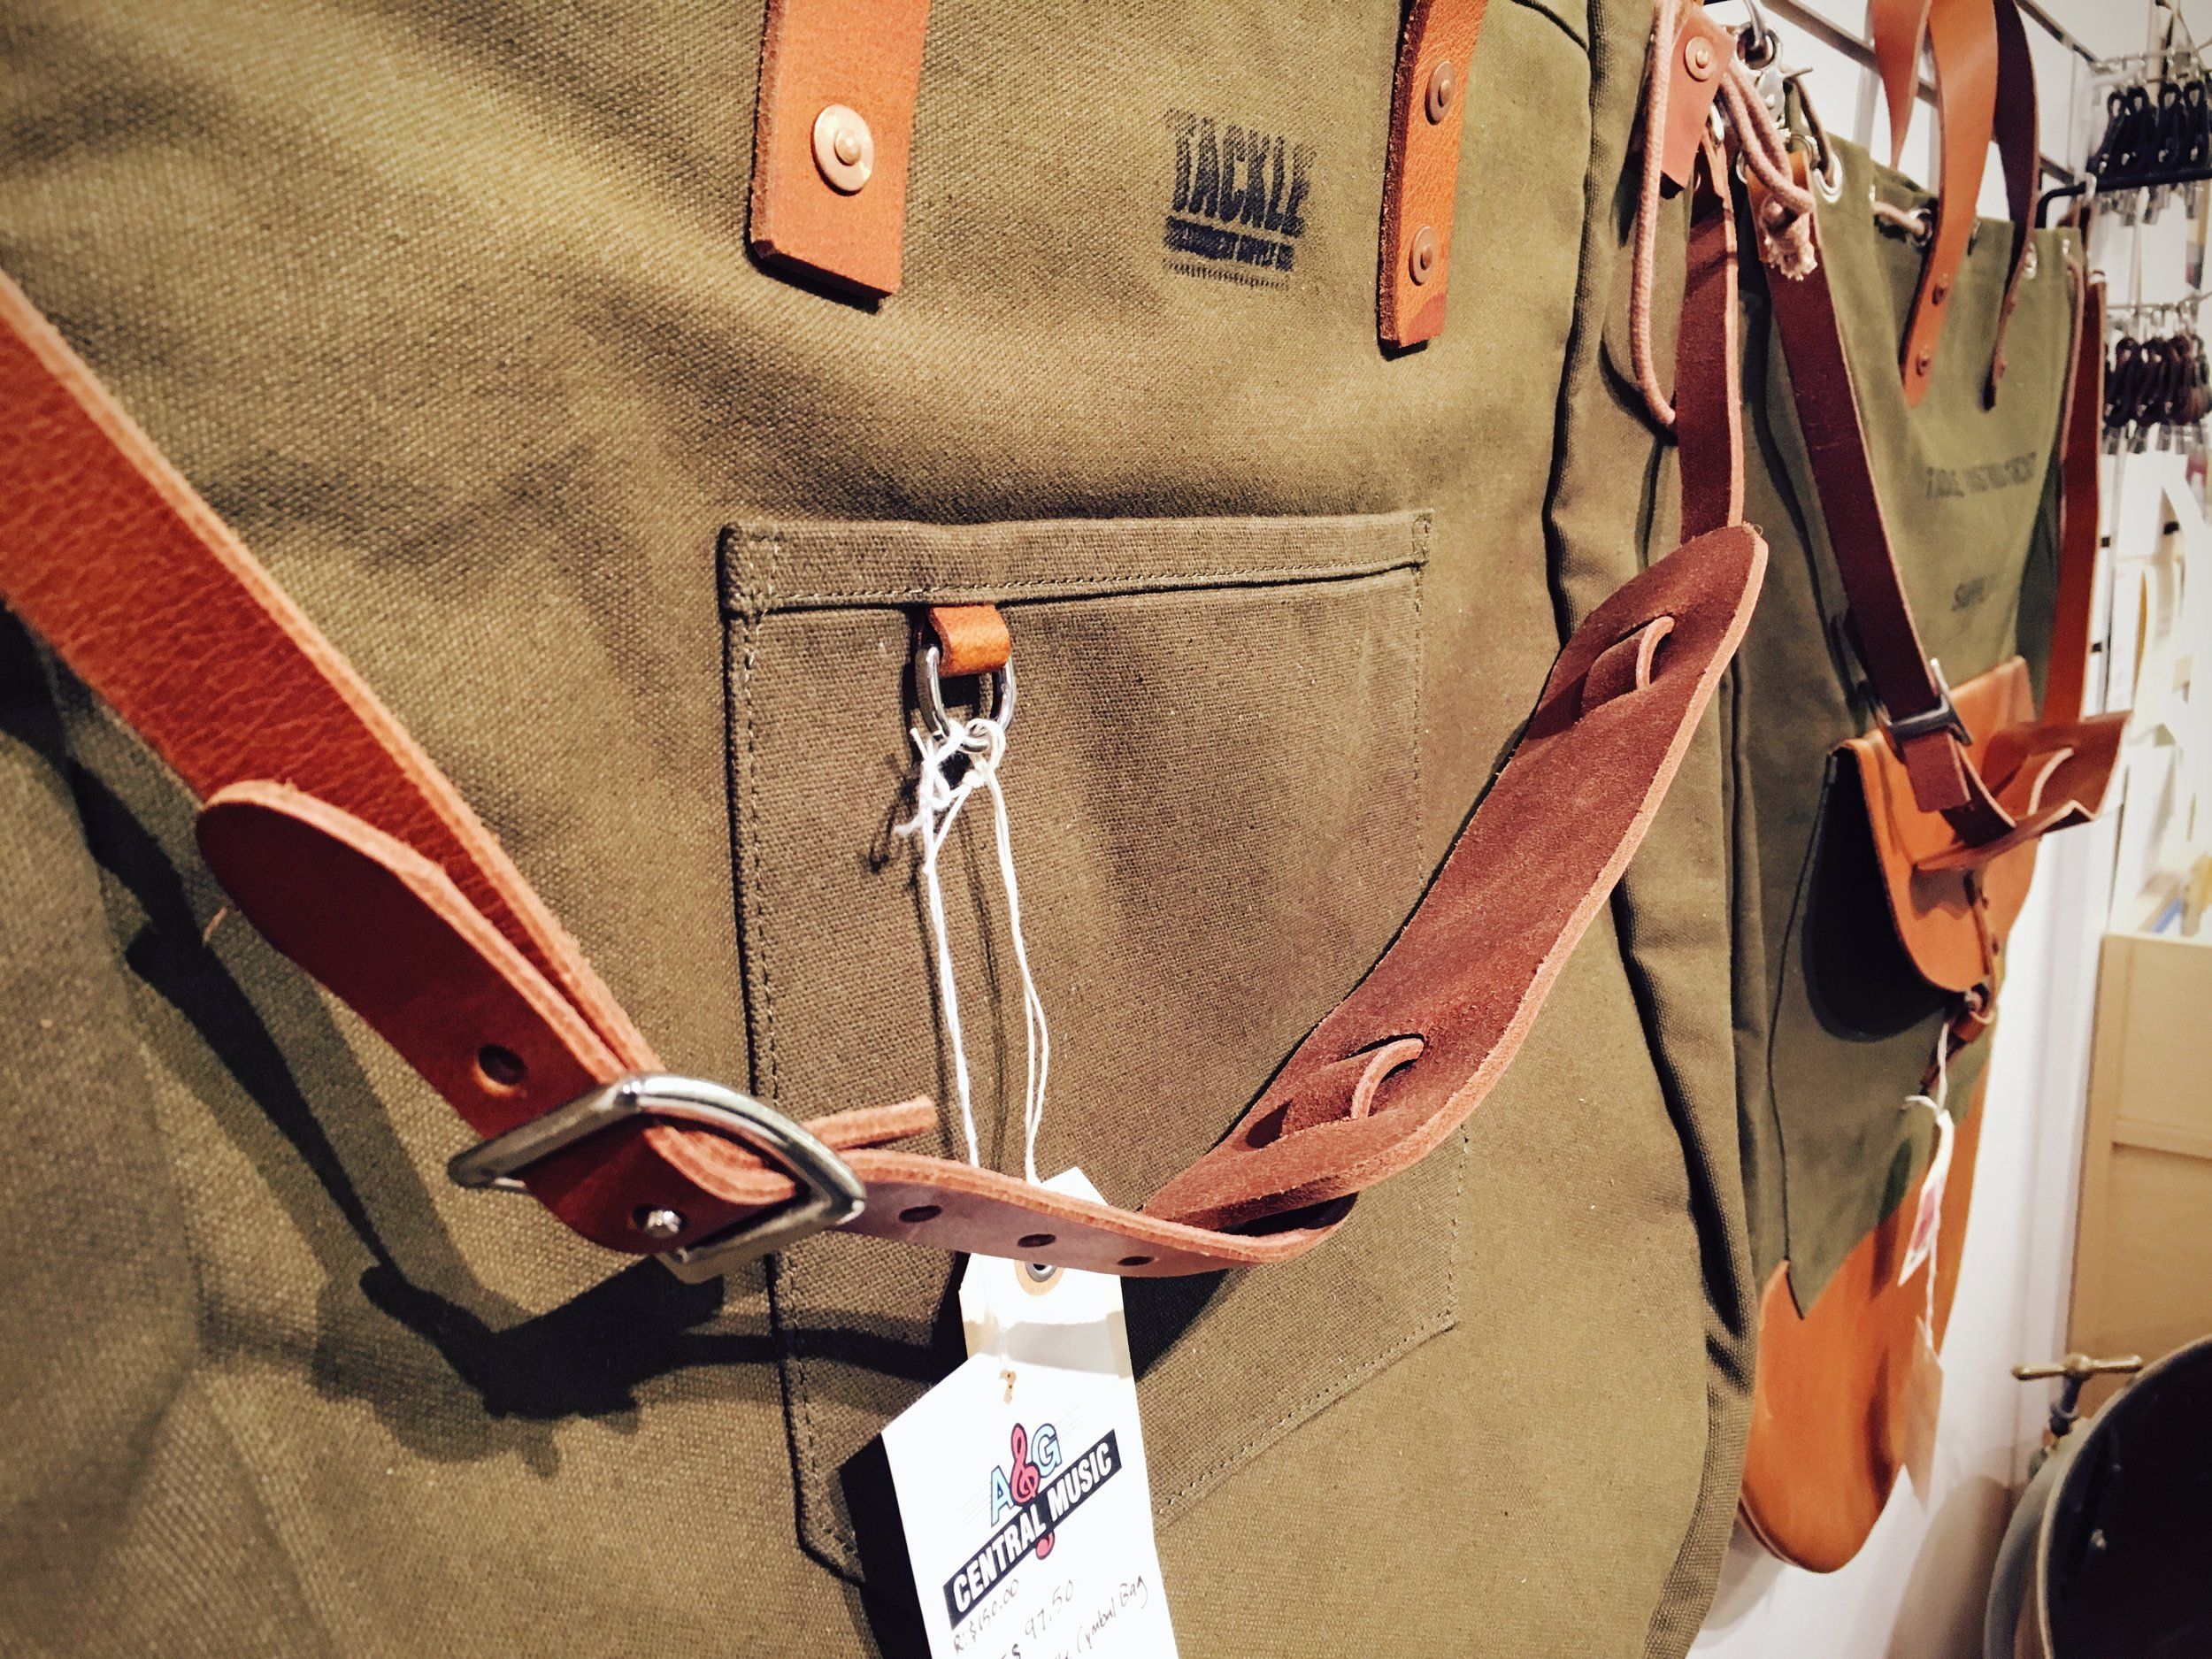 Tackle Instrument Cymbal Bag